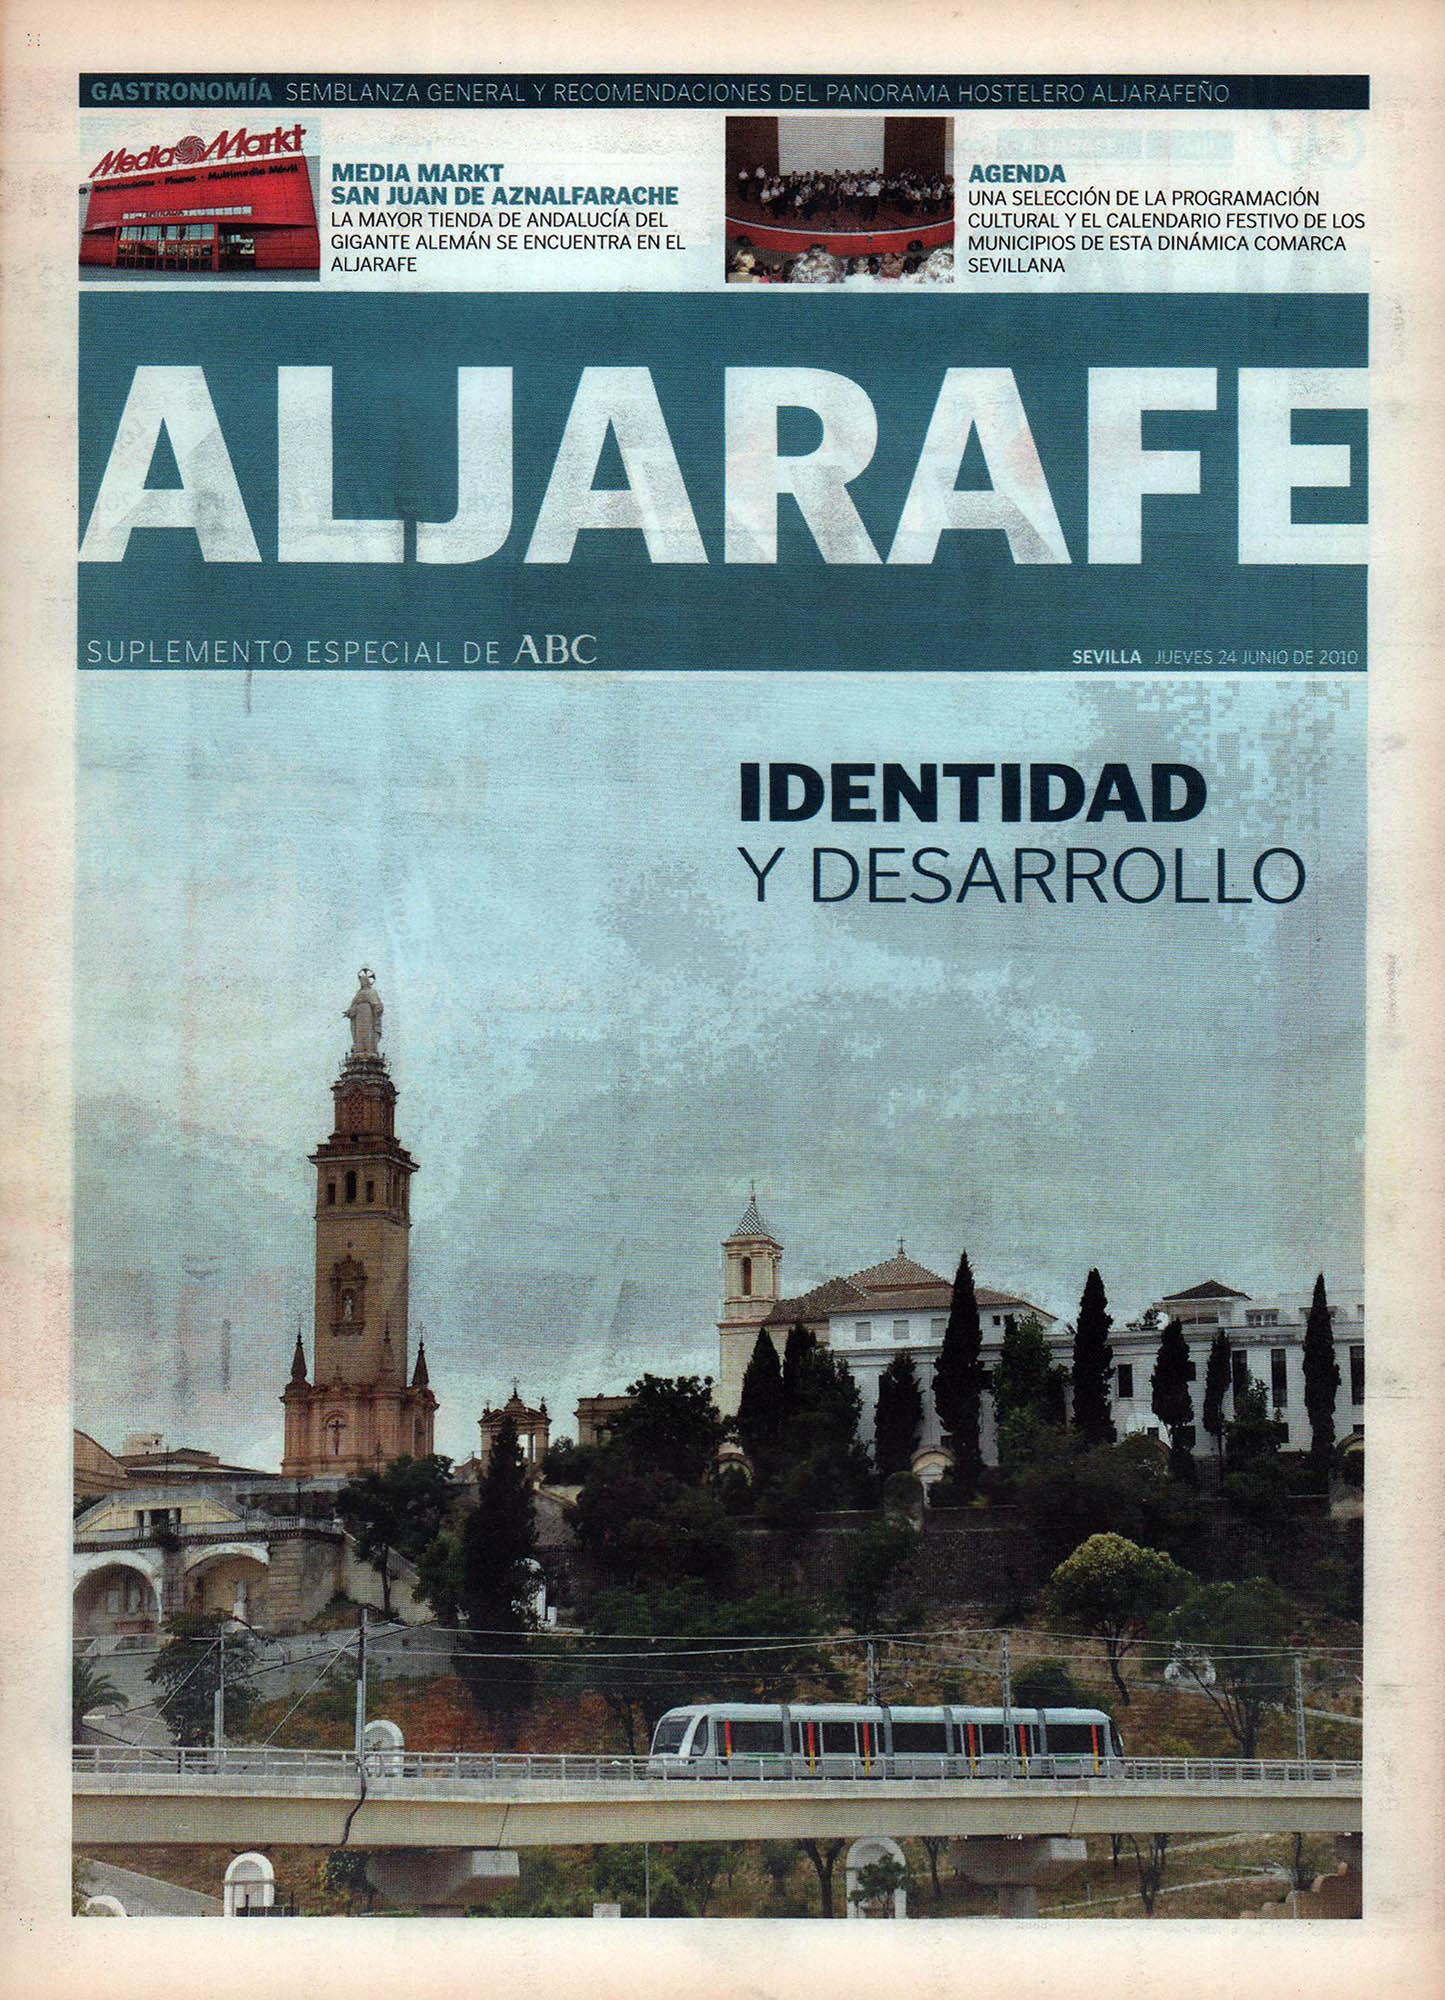 Aljarafe | Suplemento especial – ABC de Sevilla | 24 jun 2010